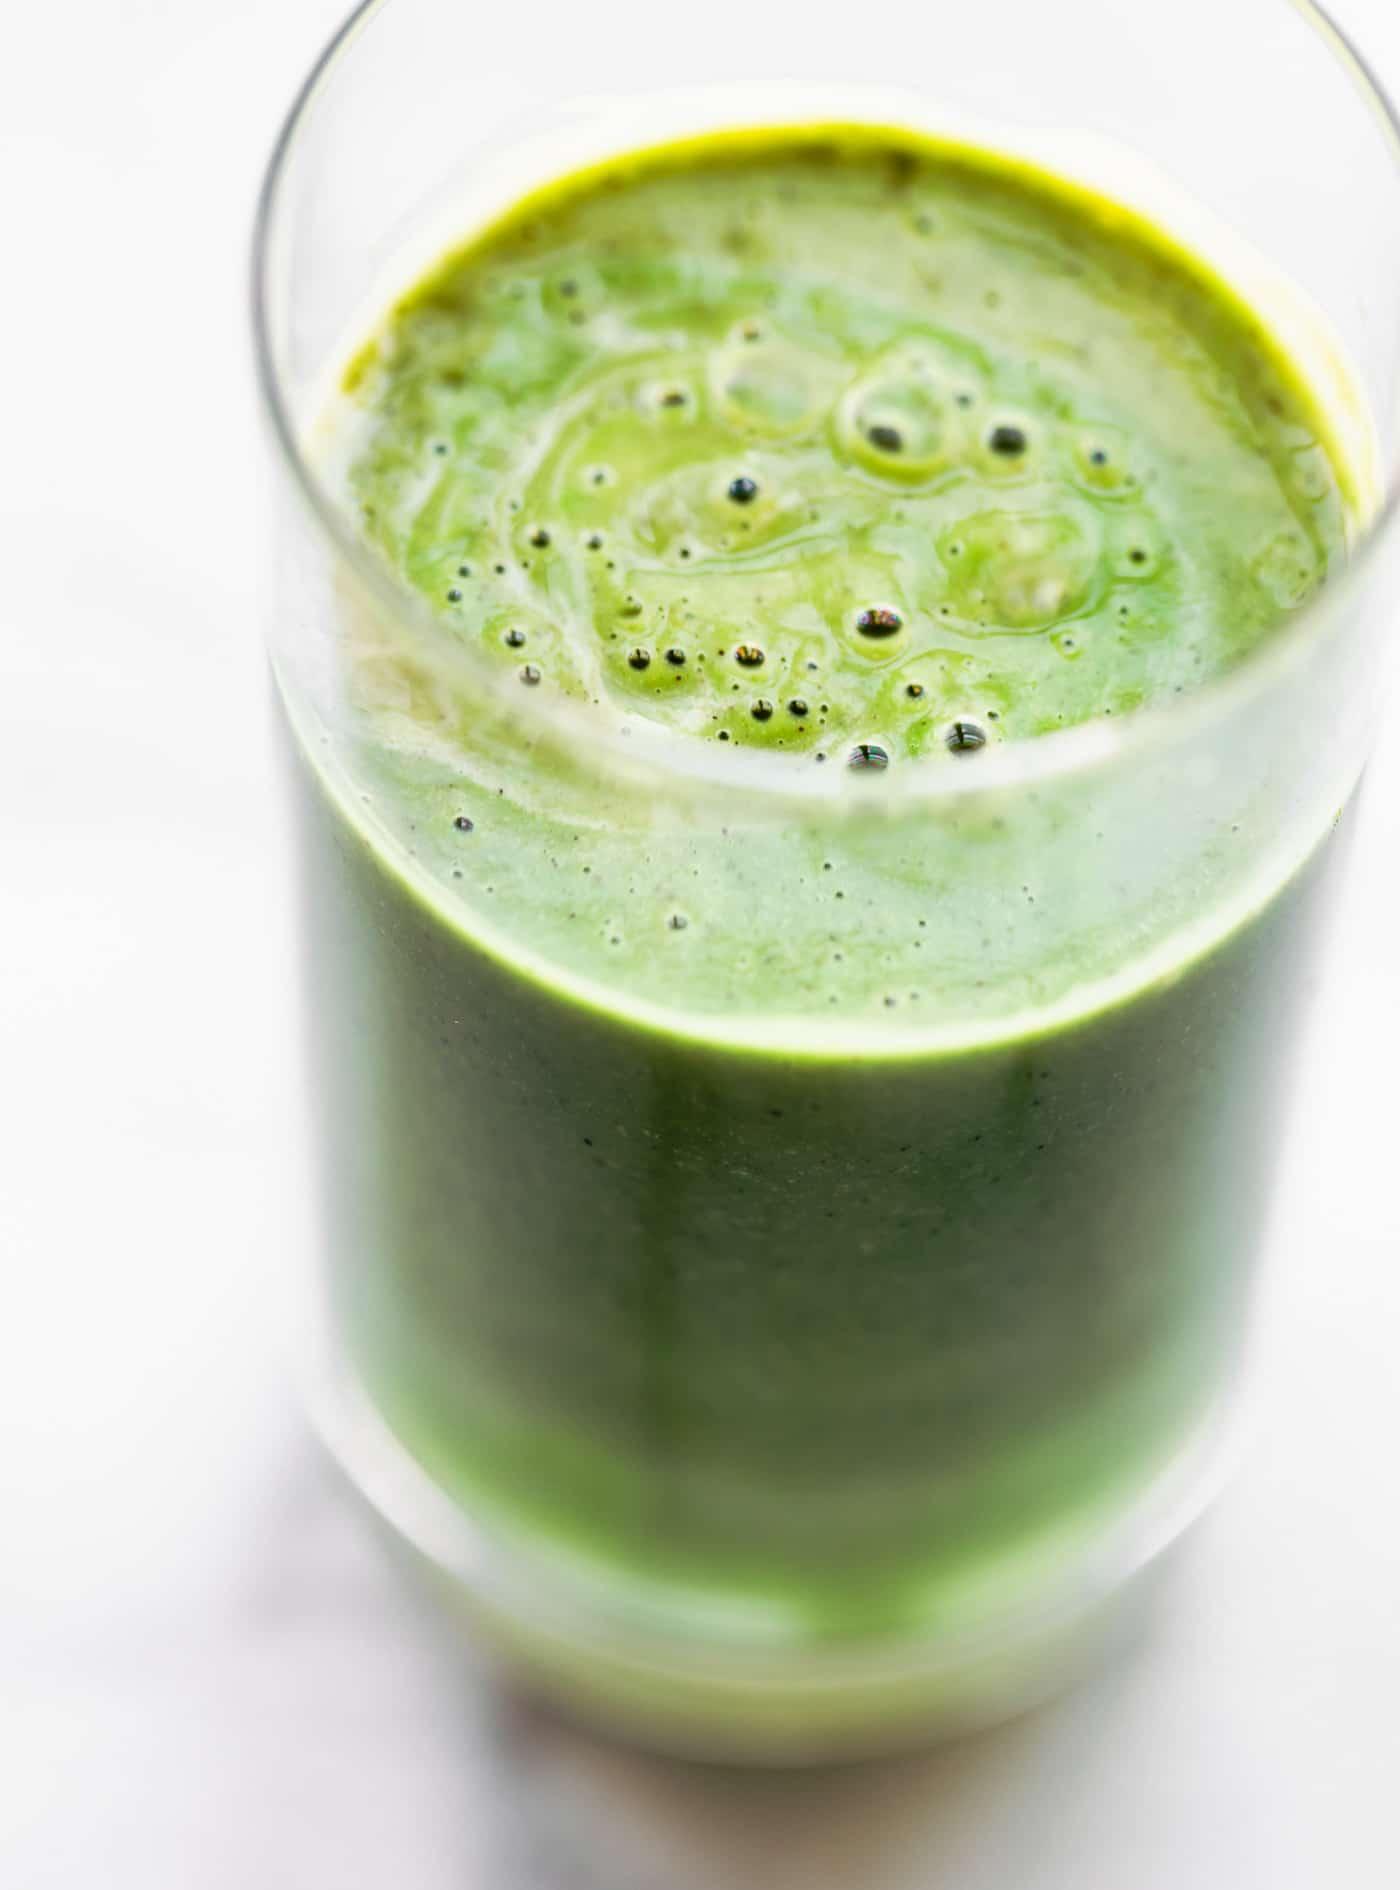 Close up image of superfood green kiwi smoothie with spirulina